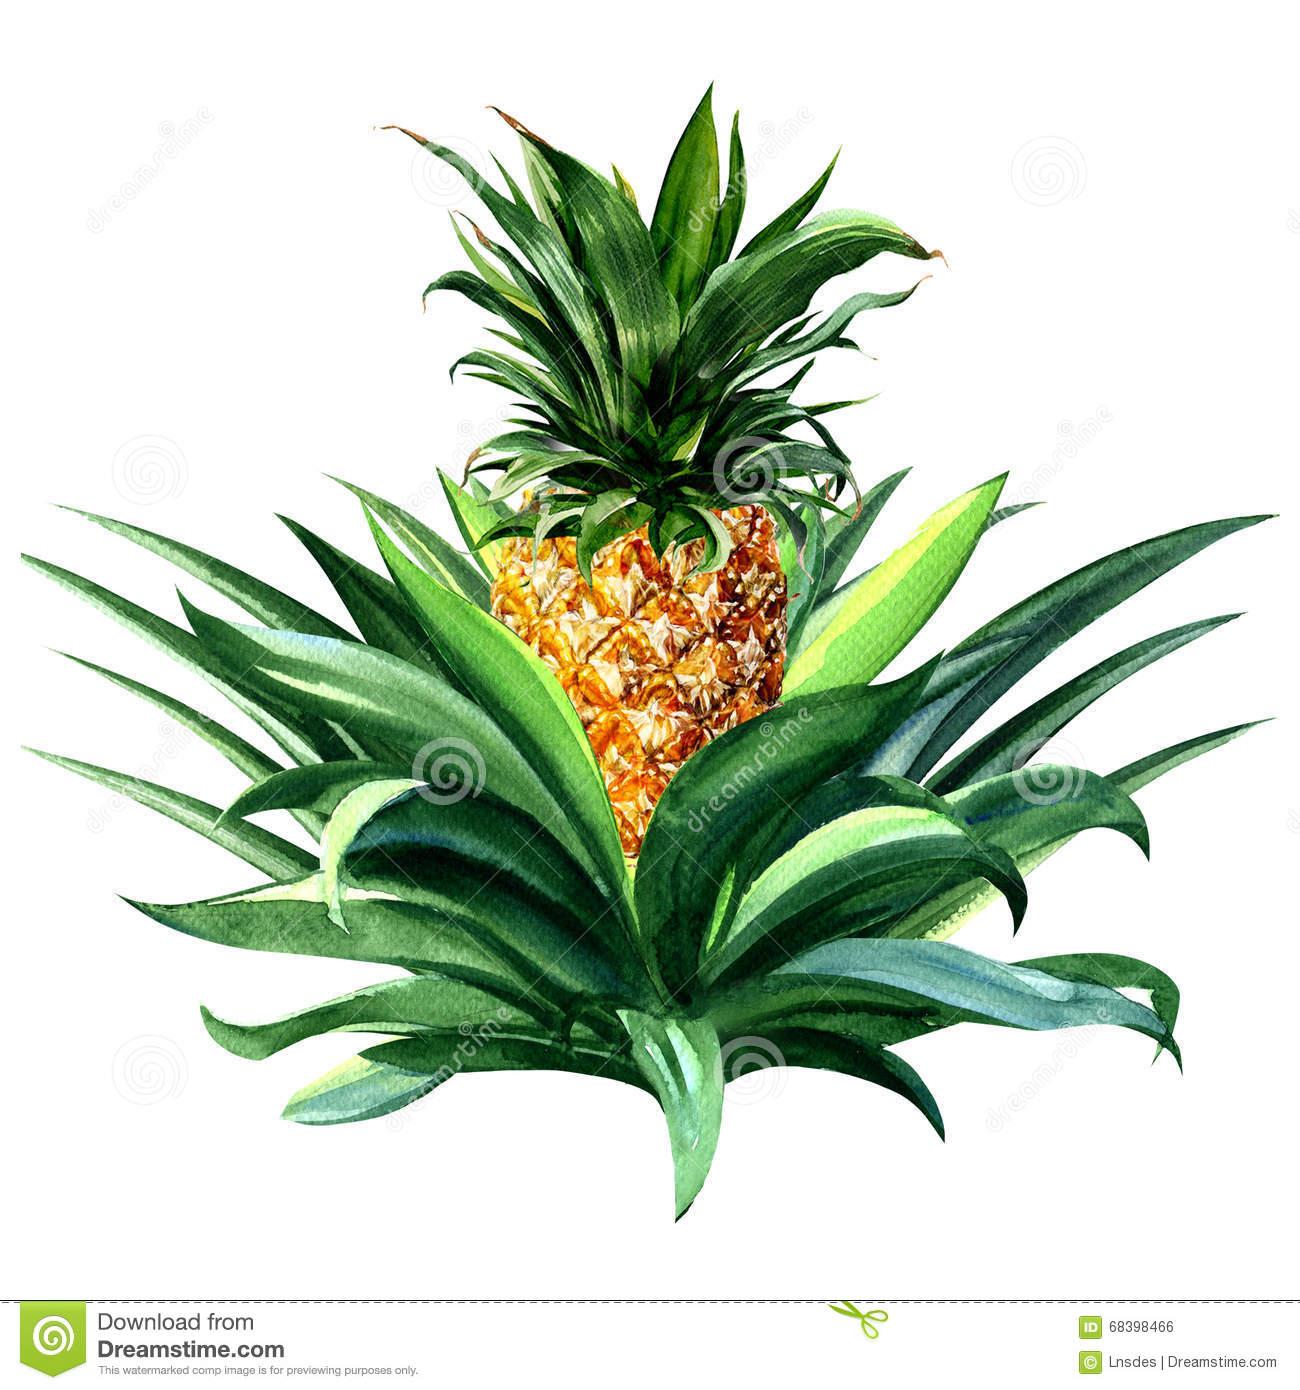 Growing Fruit Pineapple Stock Photo.